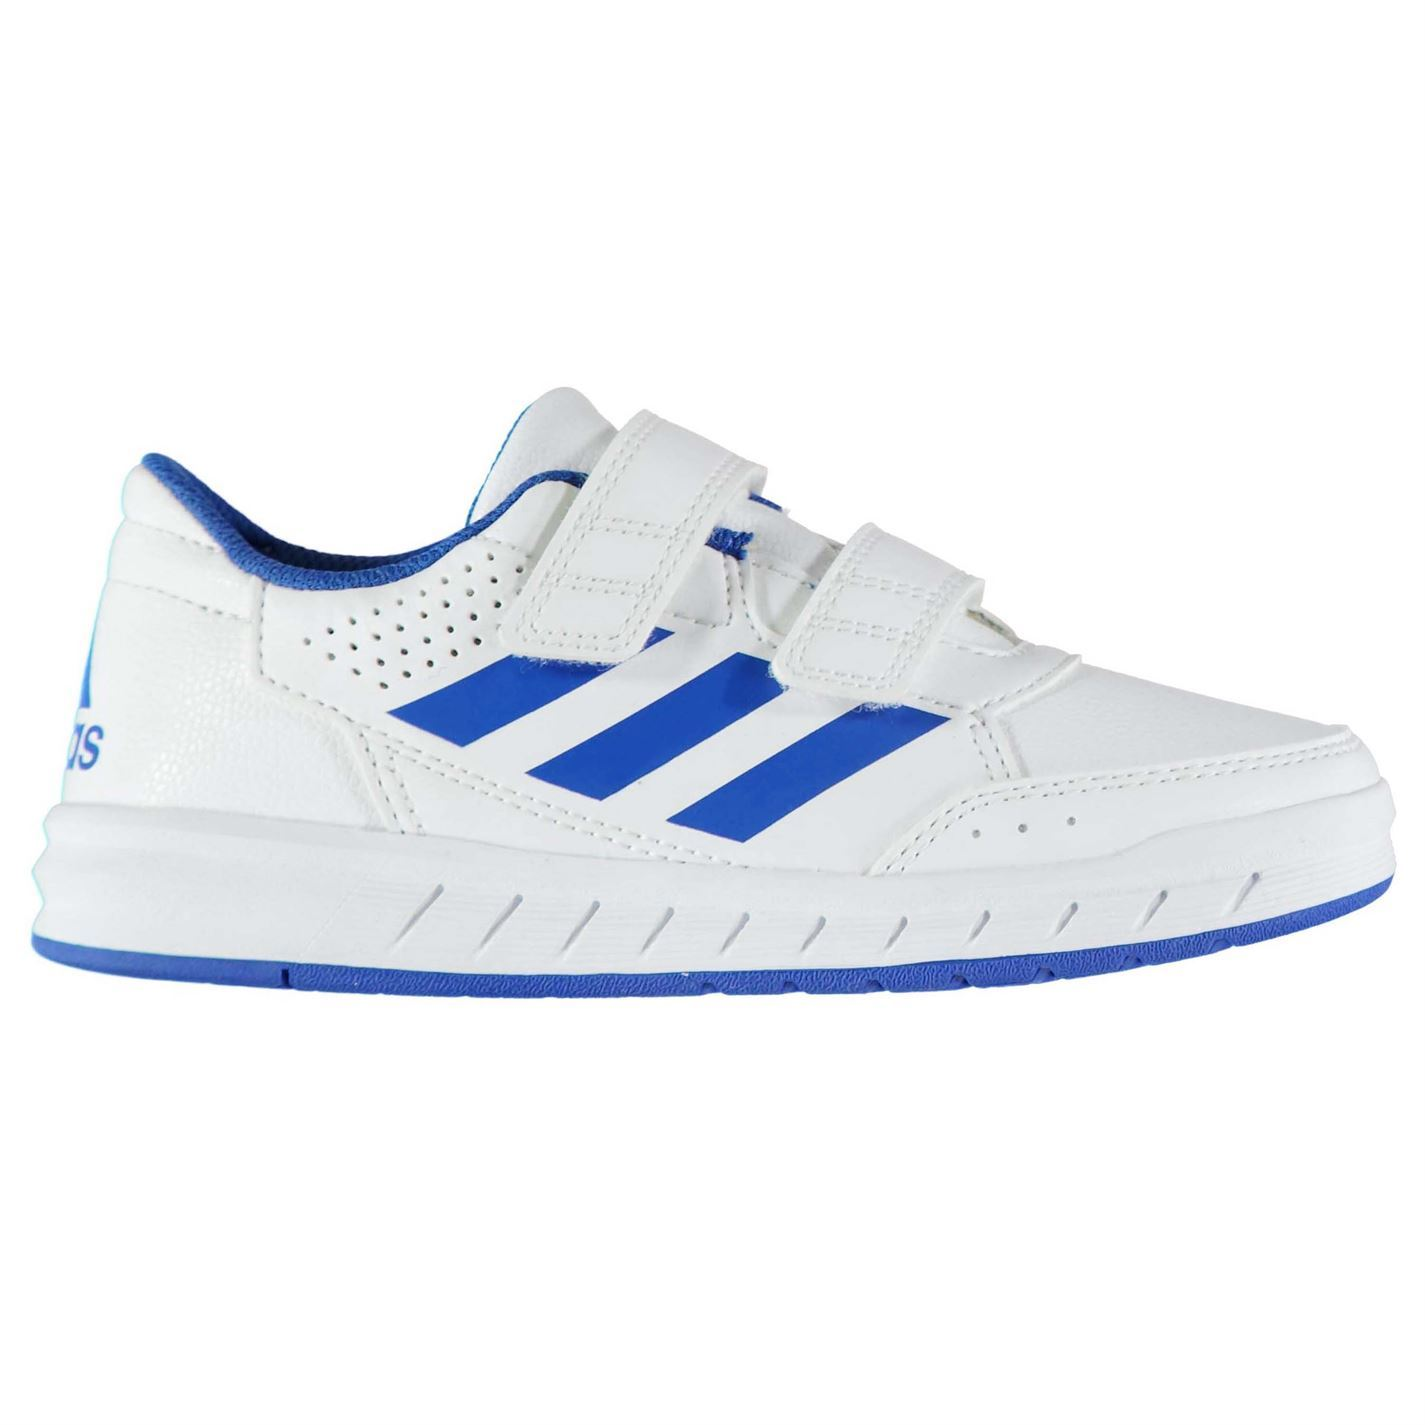 miniatura 17 - ADIDAS-alta-Sport-CF-Scarpe-da-ginnastica-bambino-ragazzo-calzature